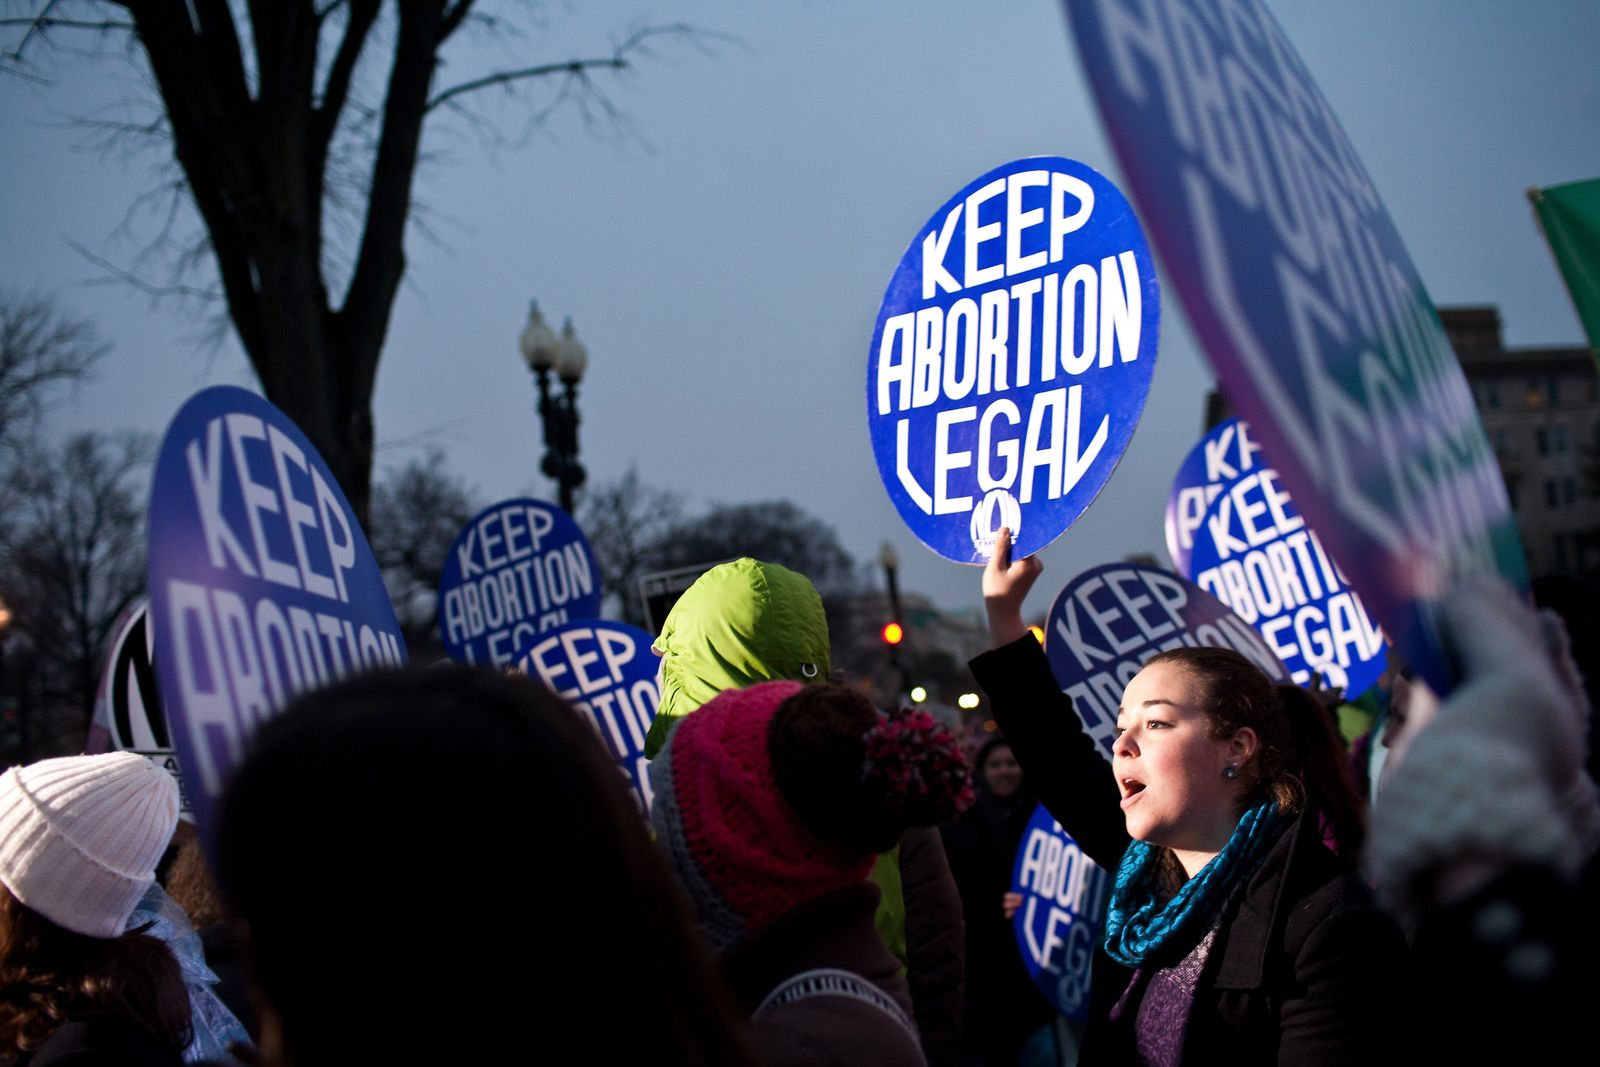 USA/ Abtreibung